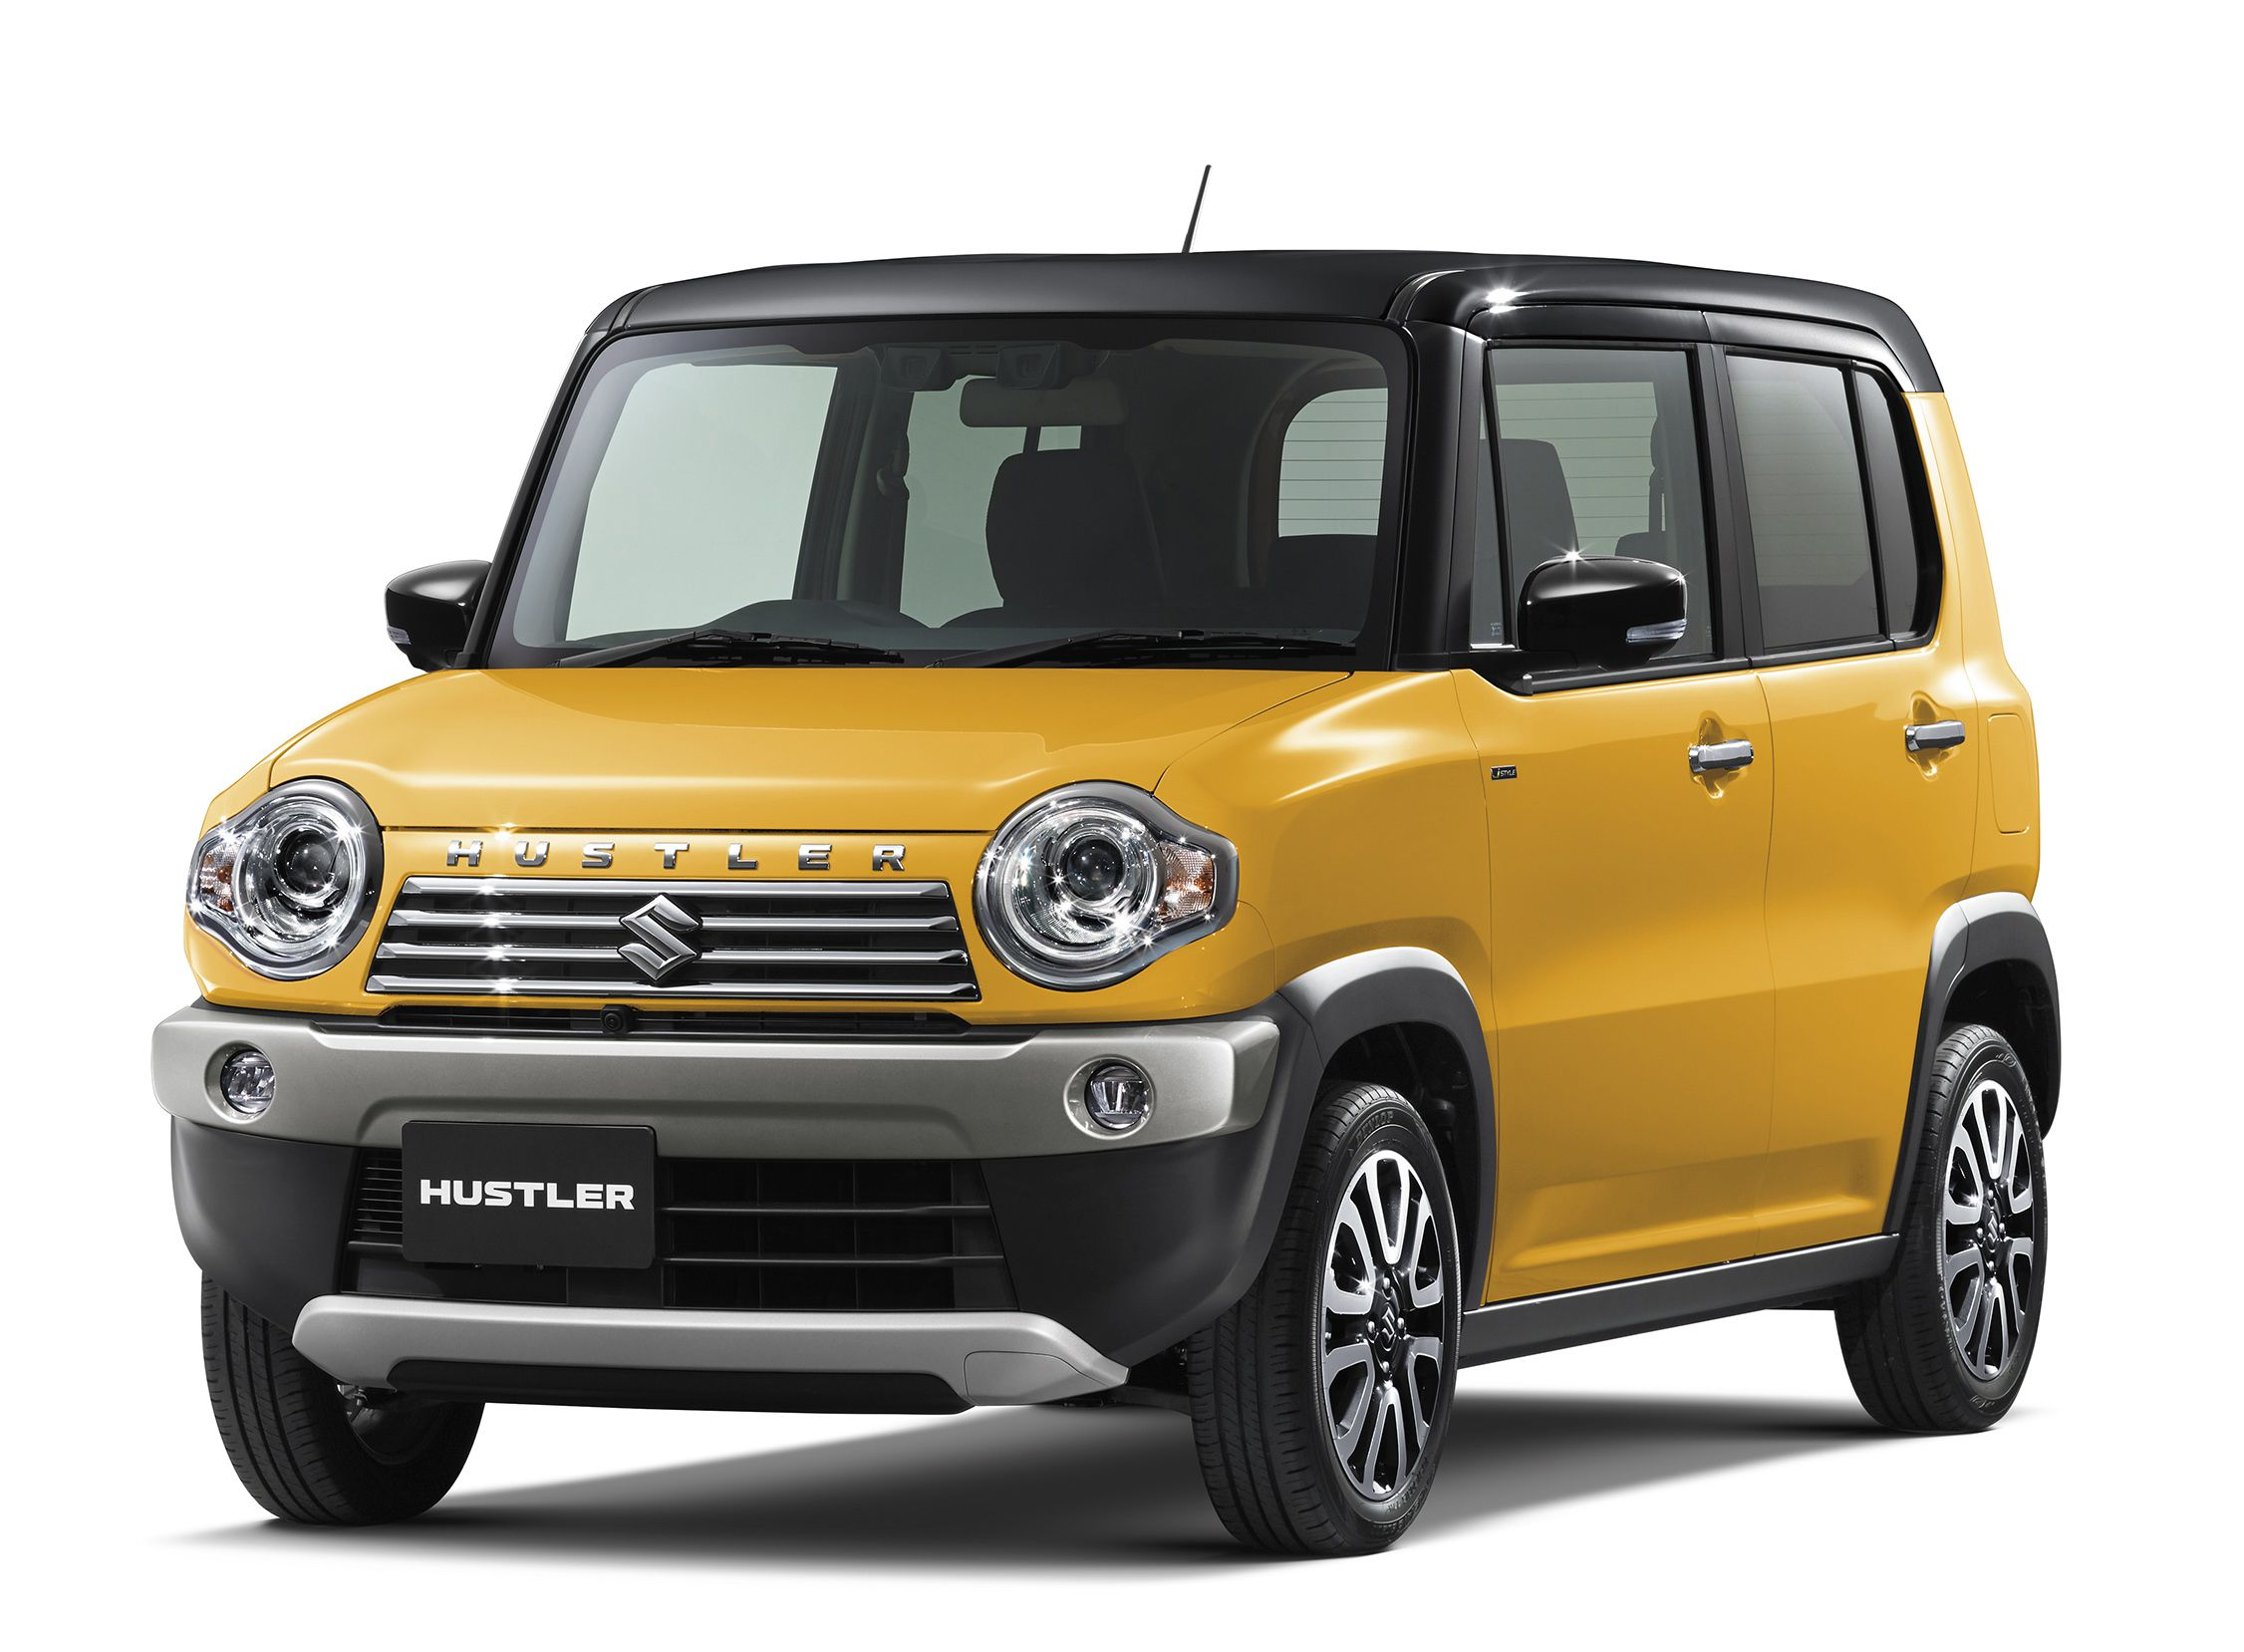 Suzuki hustler http autotema org ua kej kar